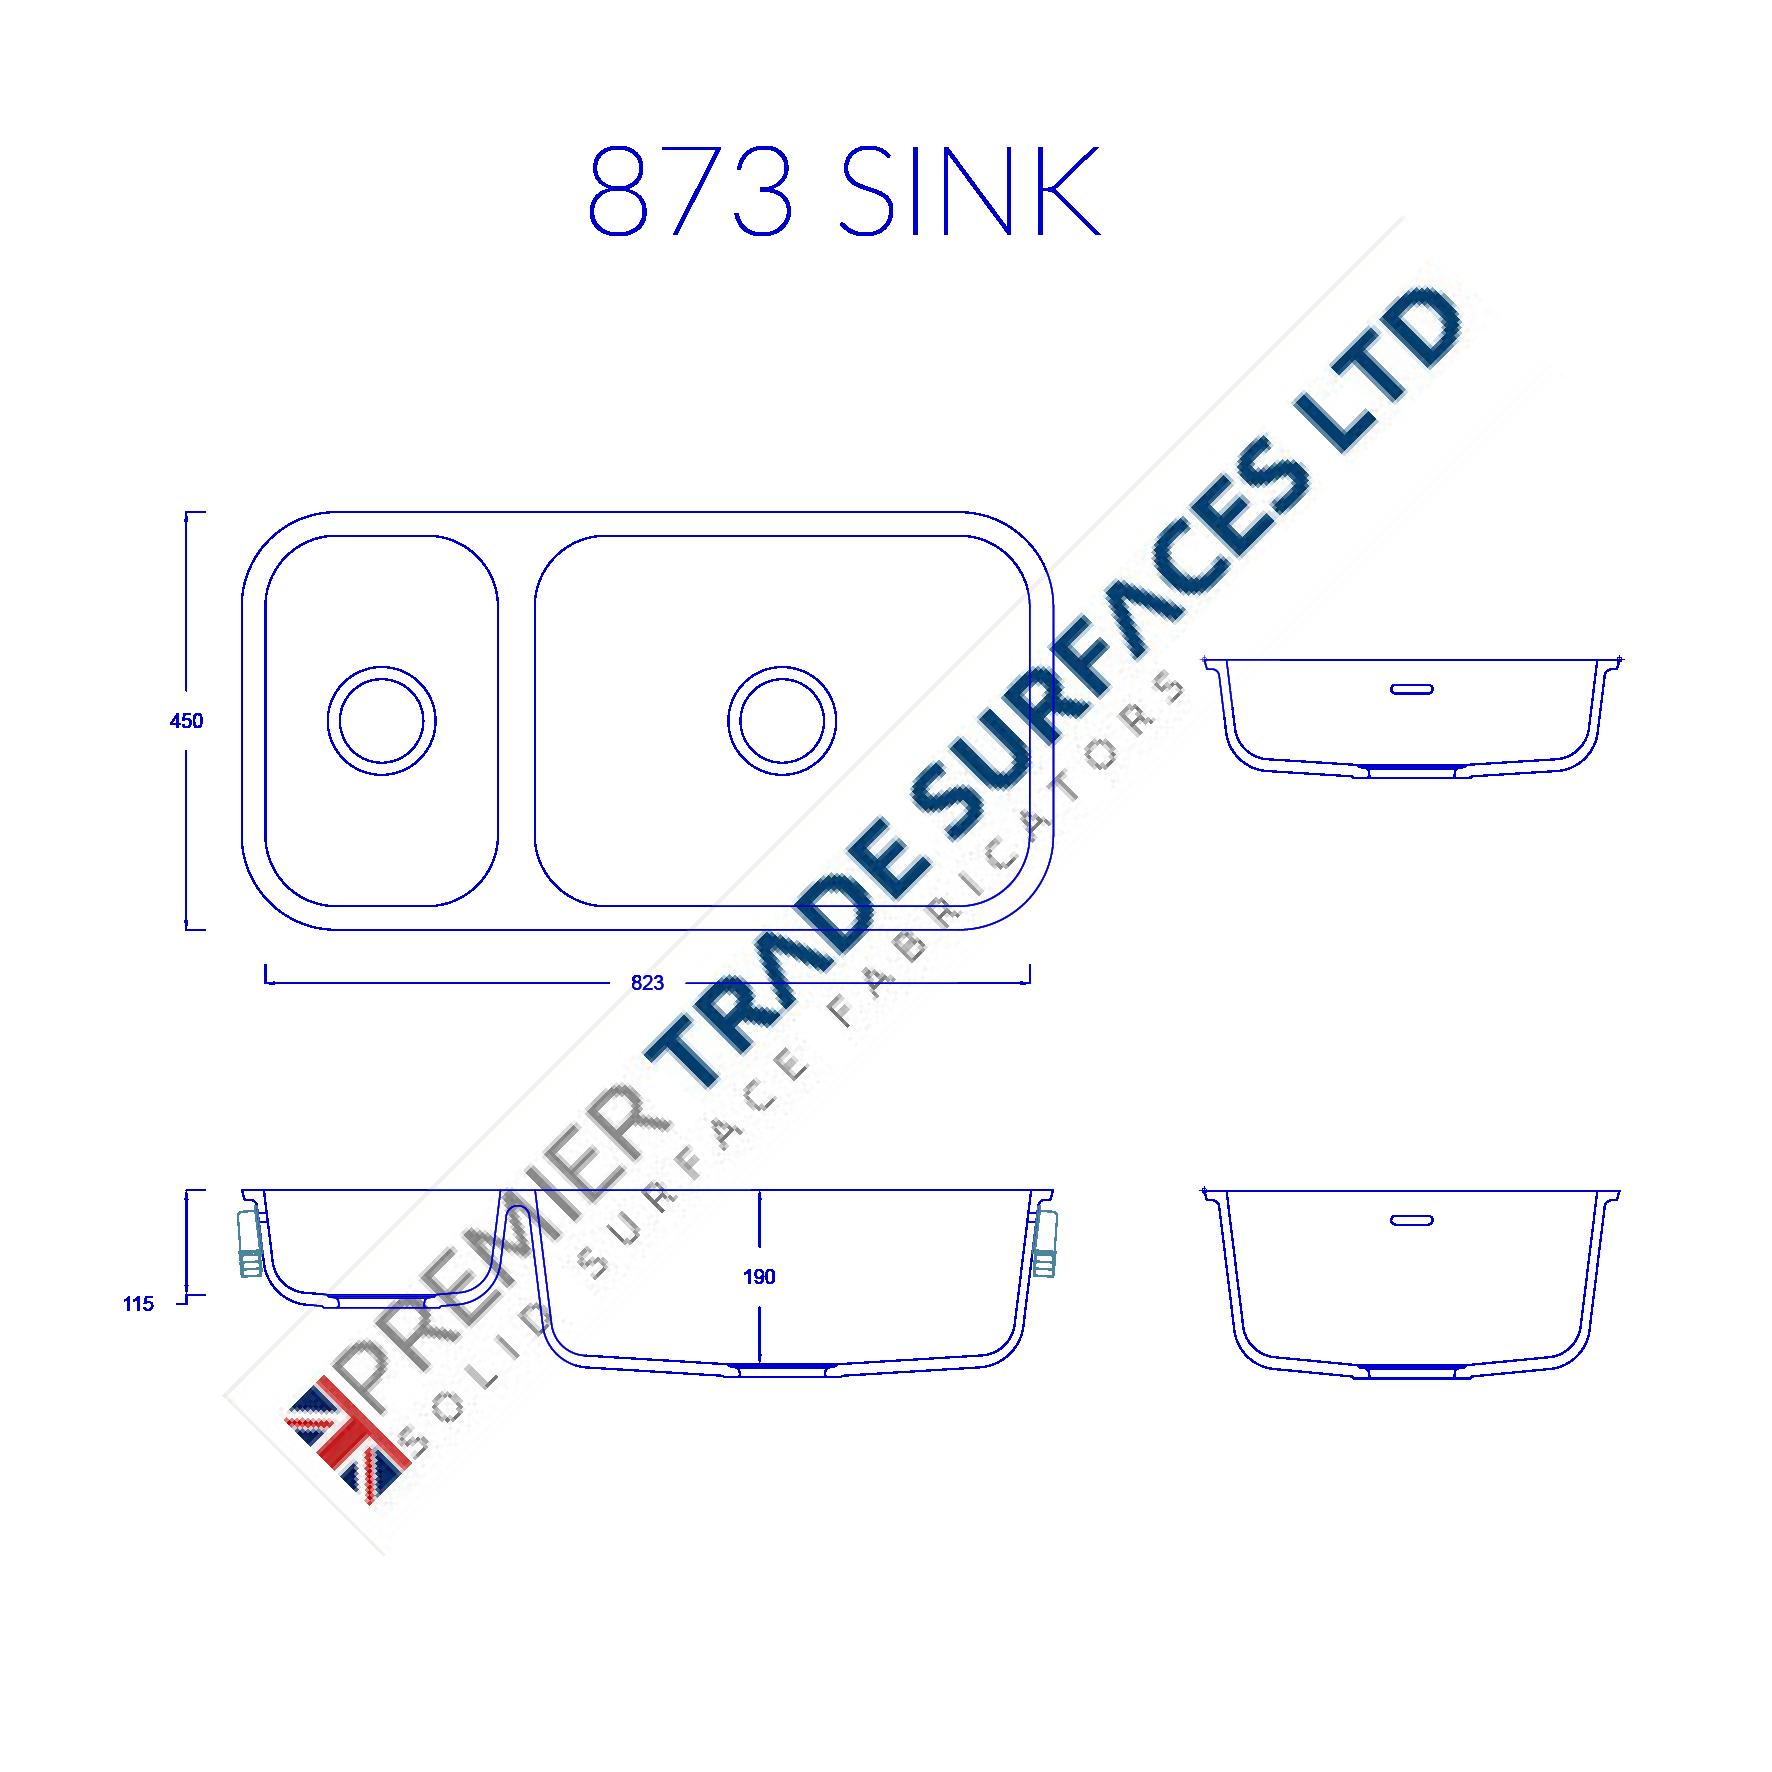 Corian Sinks - Premier Trade Surfaces